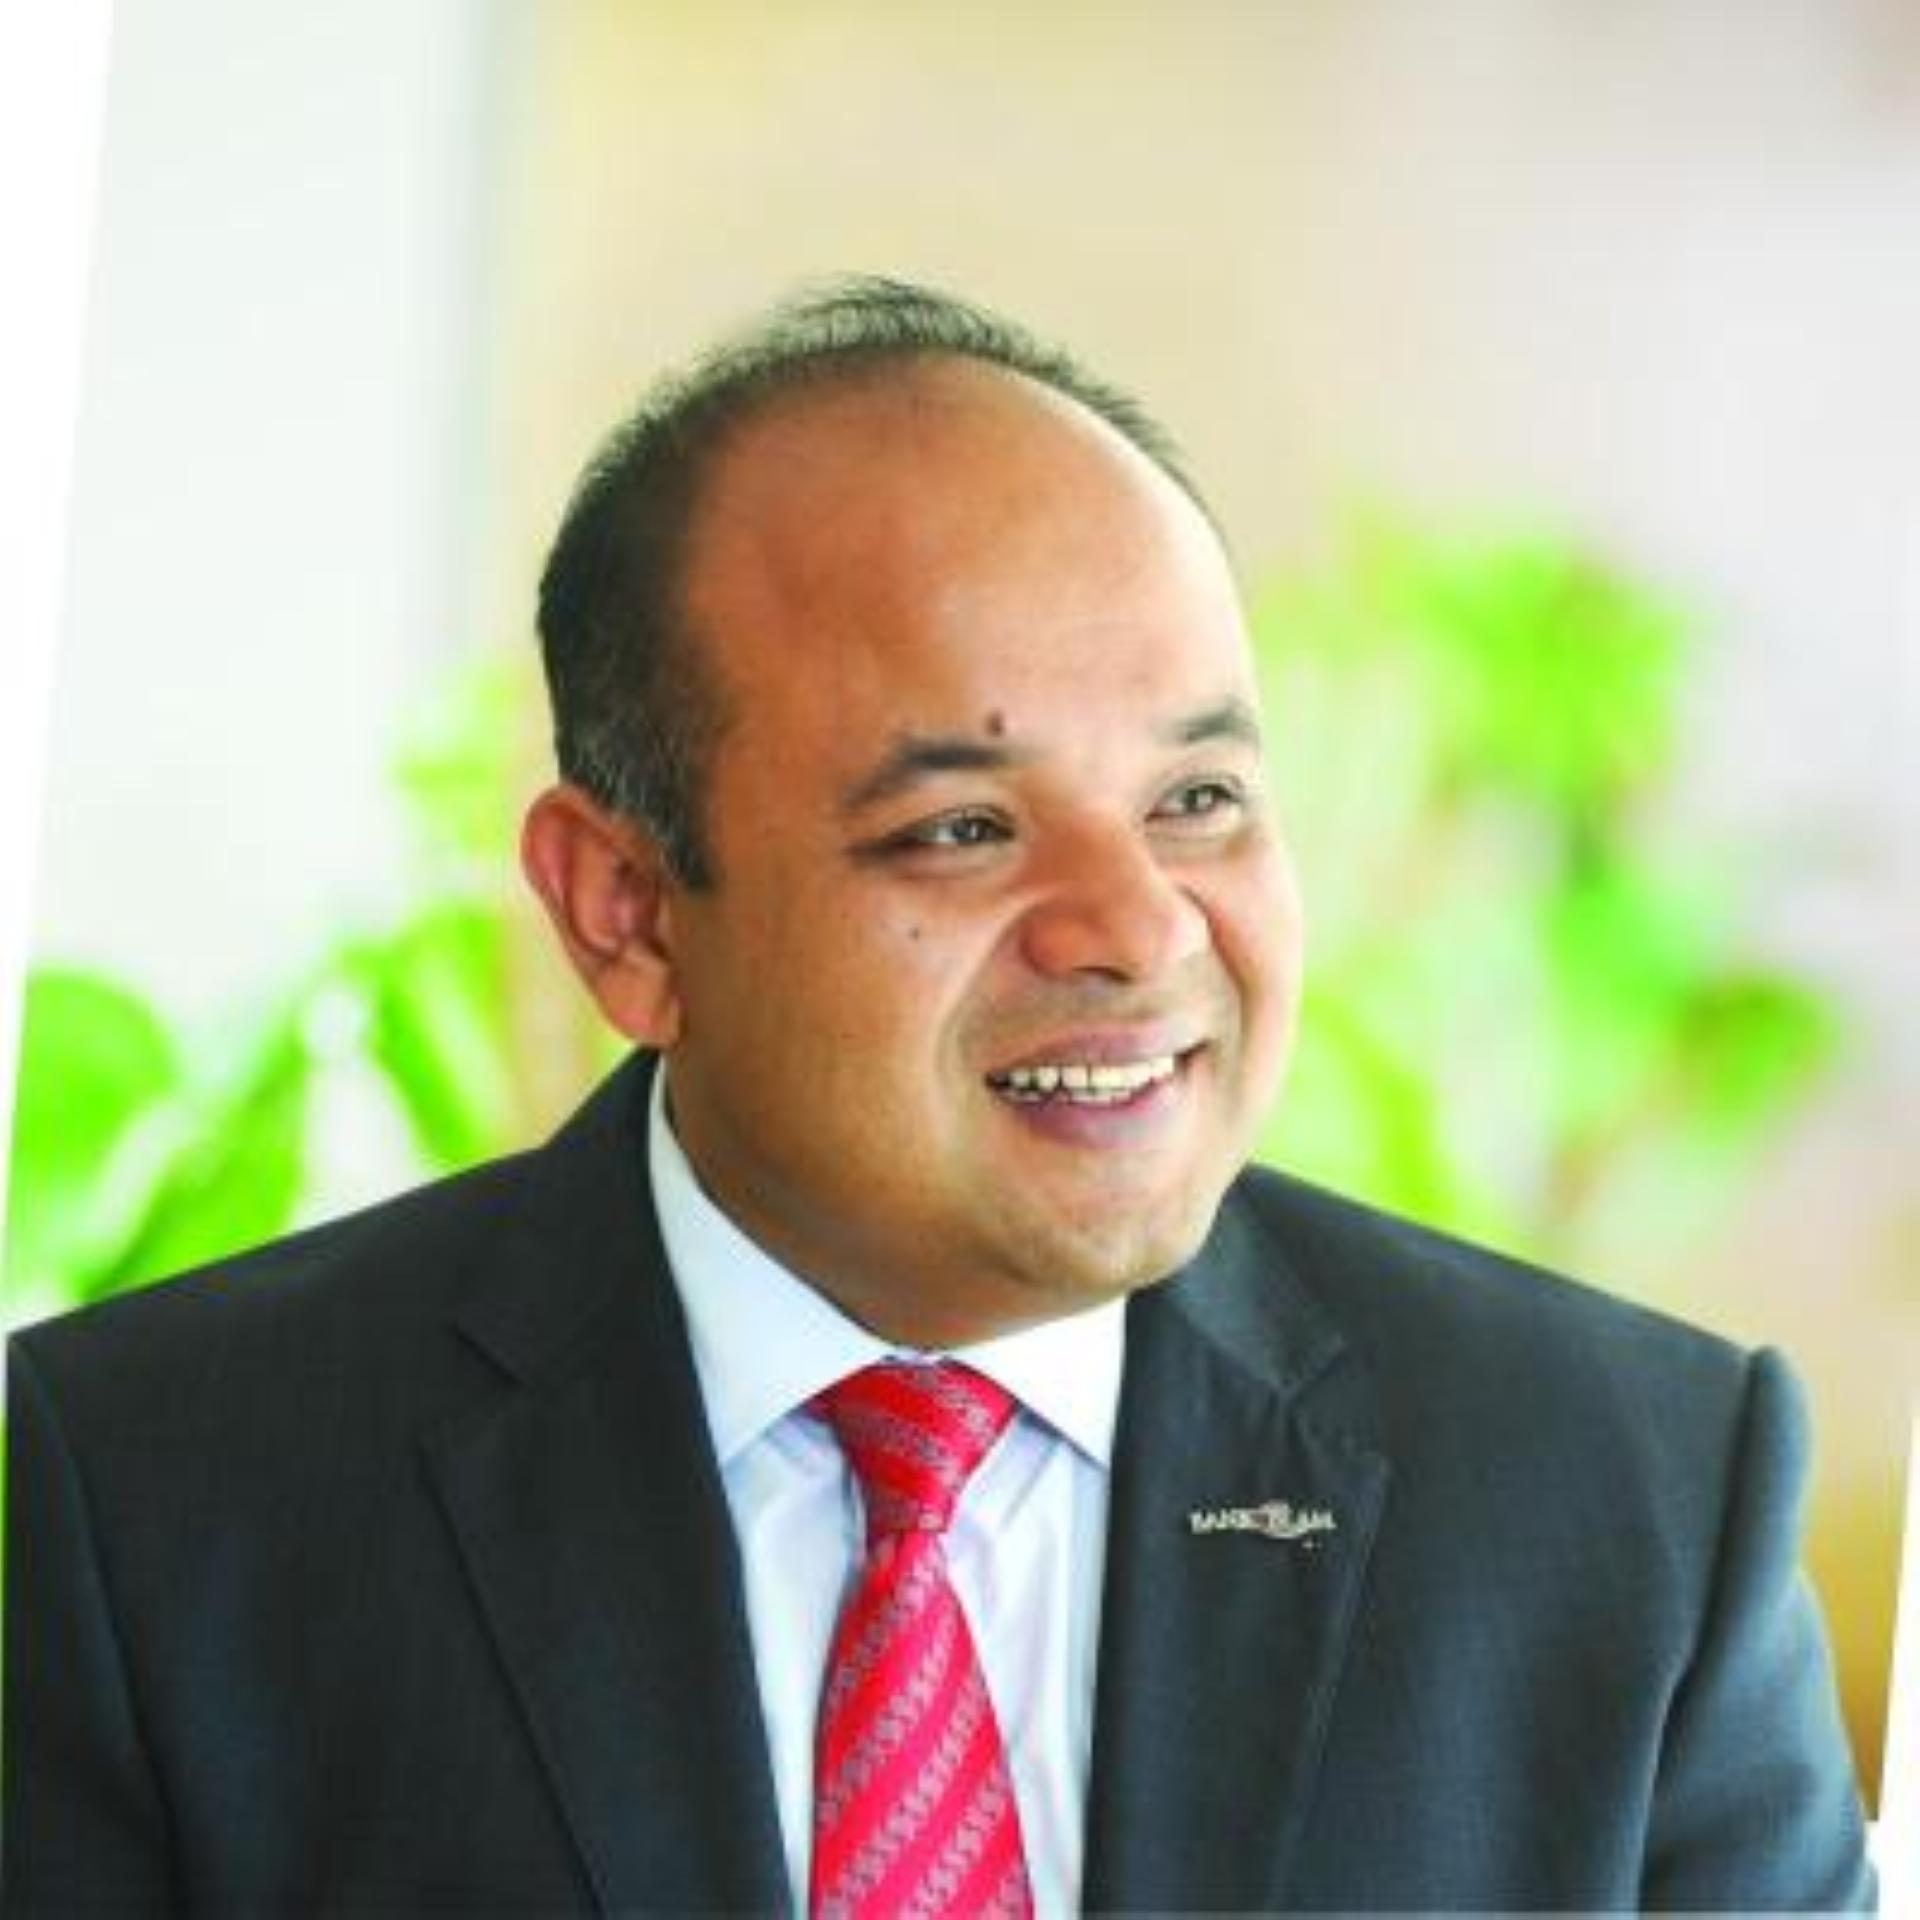 Khairul Kamarudin New Ceo Of Bank Muamalat The Star